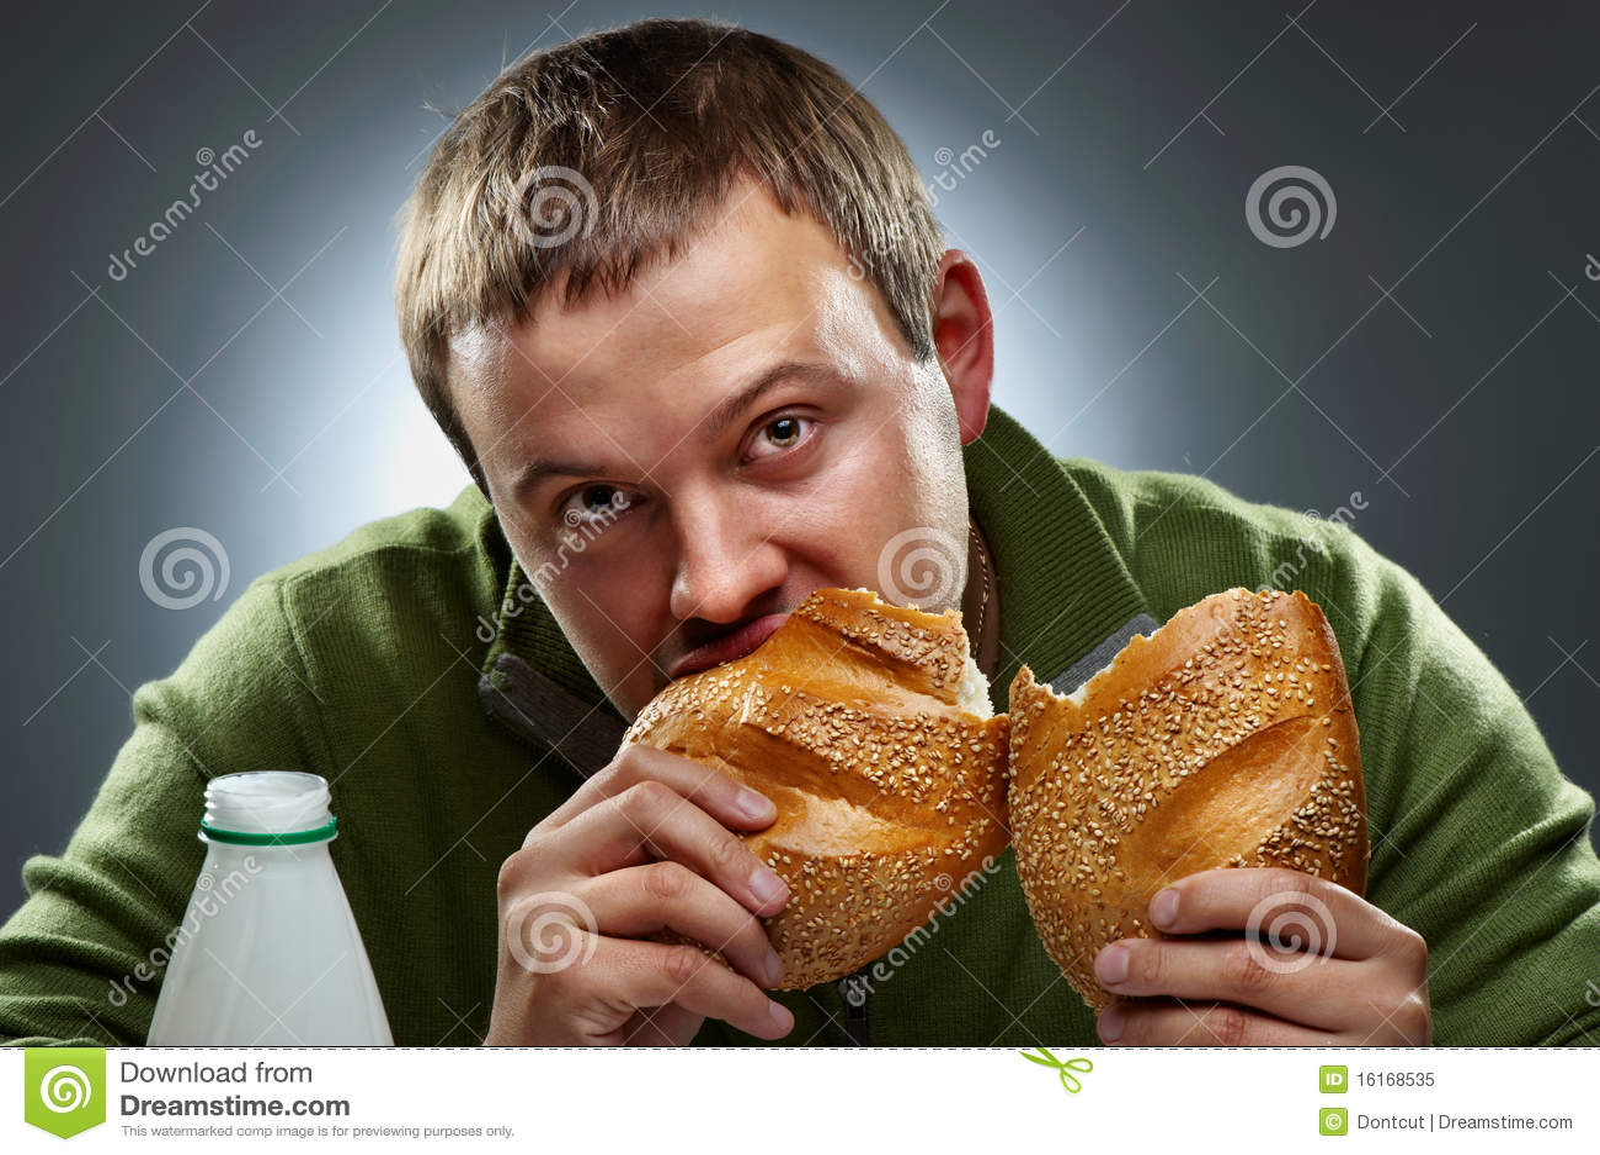 Съела хлеб со спермой 12 фотография